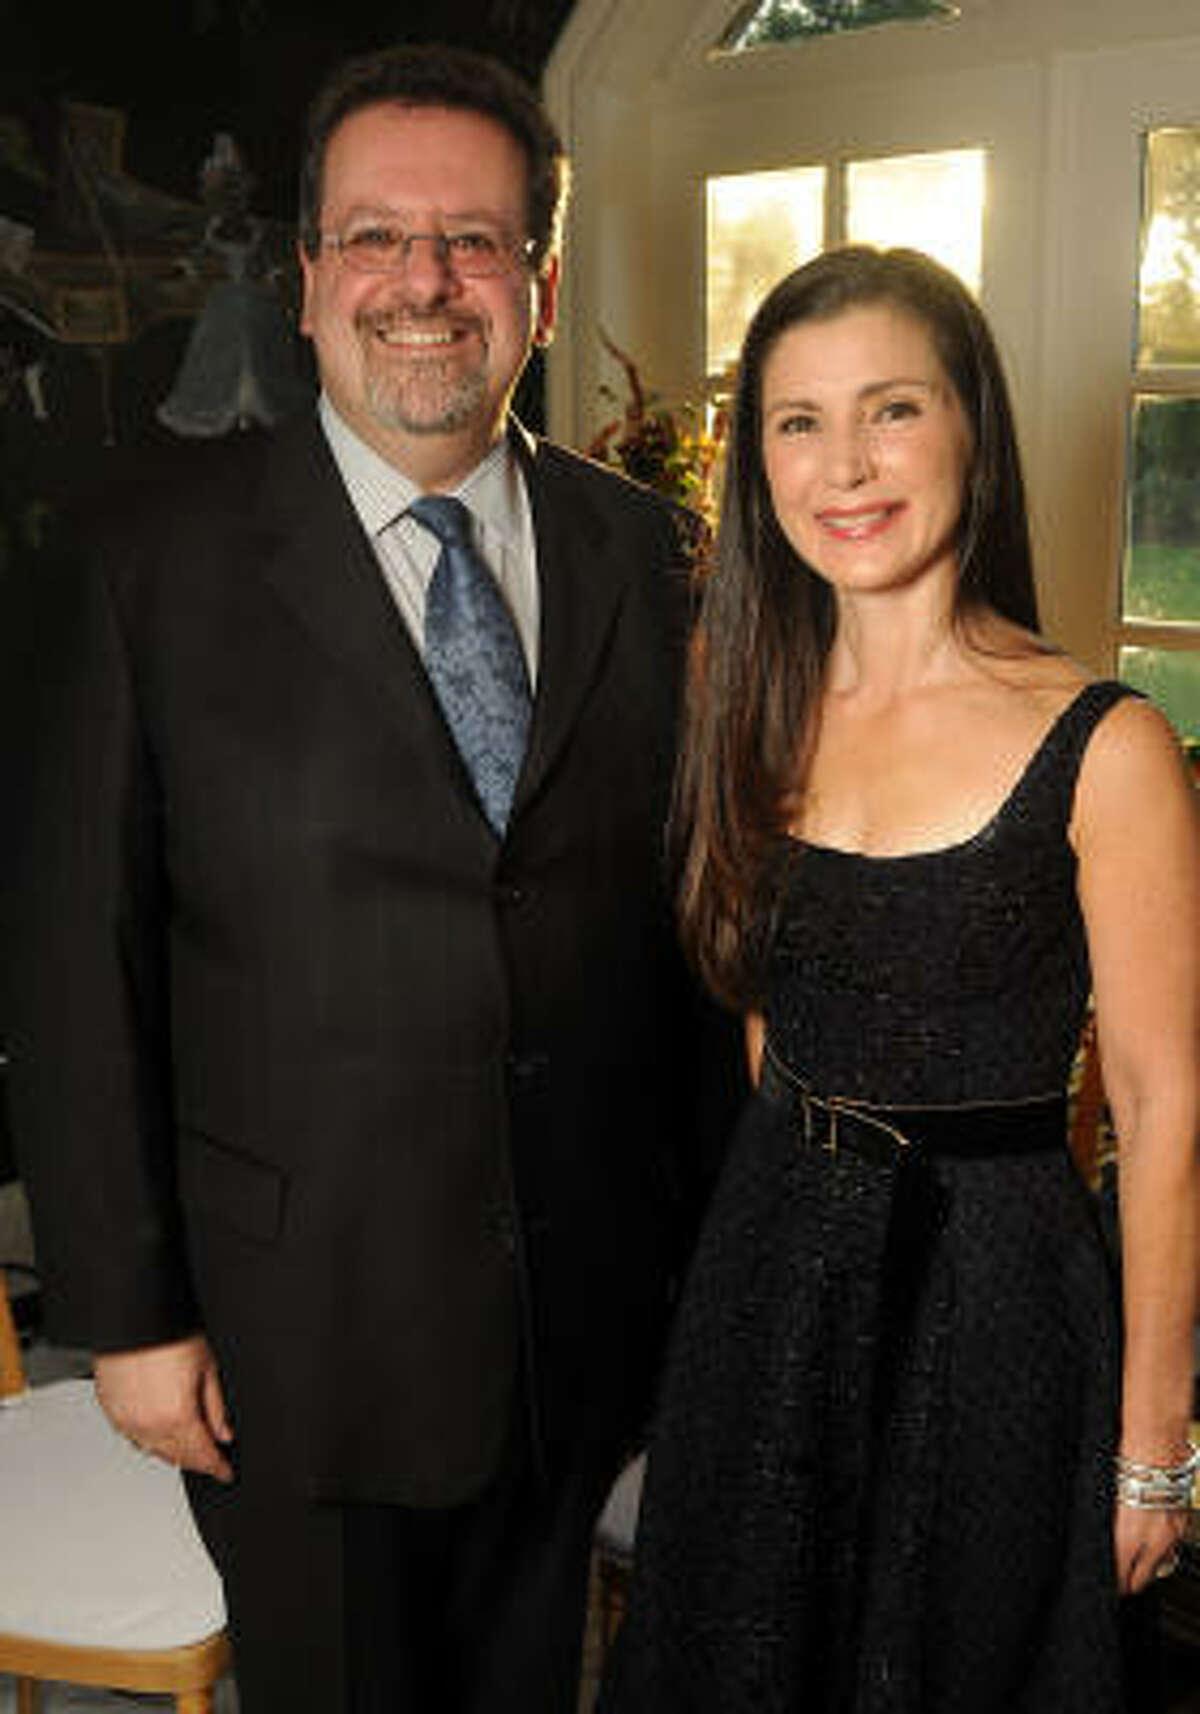 Anthony Freud and Cynthia Petrello